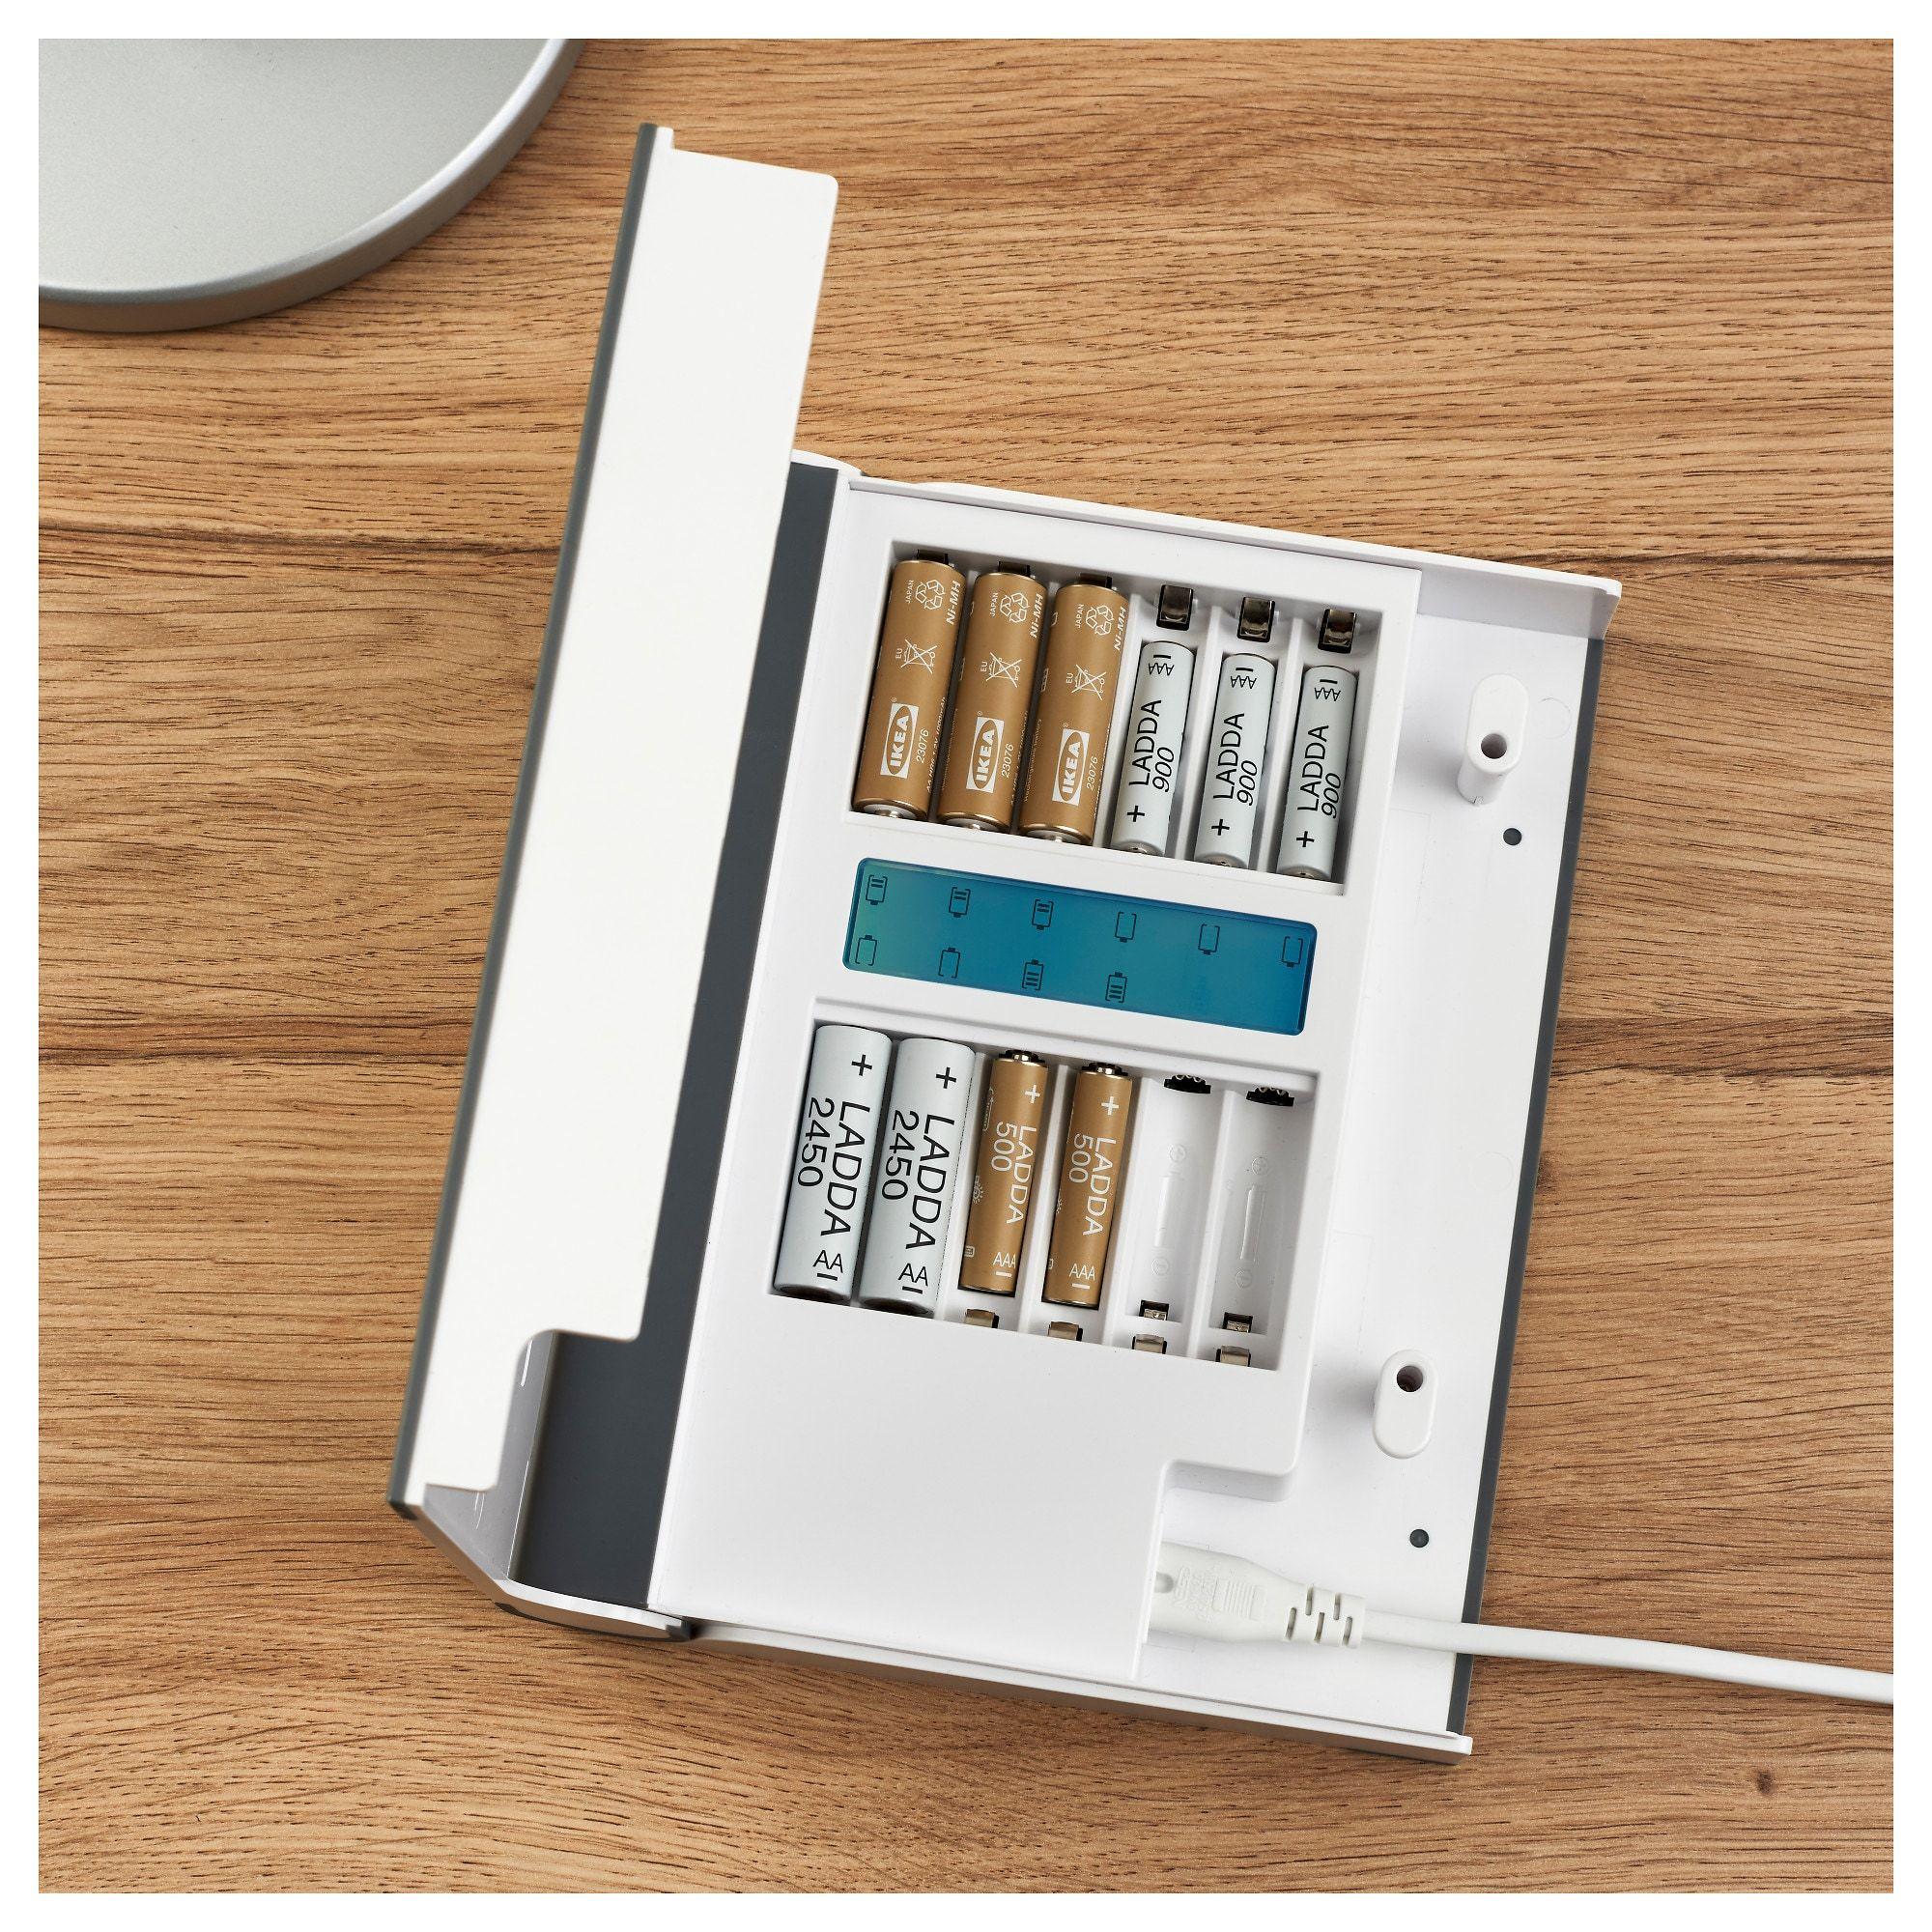 Ikea Australia Affordable Swedish Home Furniture At Home Furniture Store Cord Organization Wellness Design